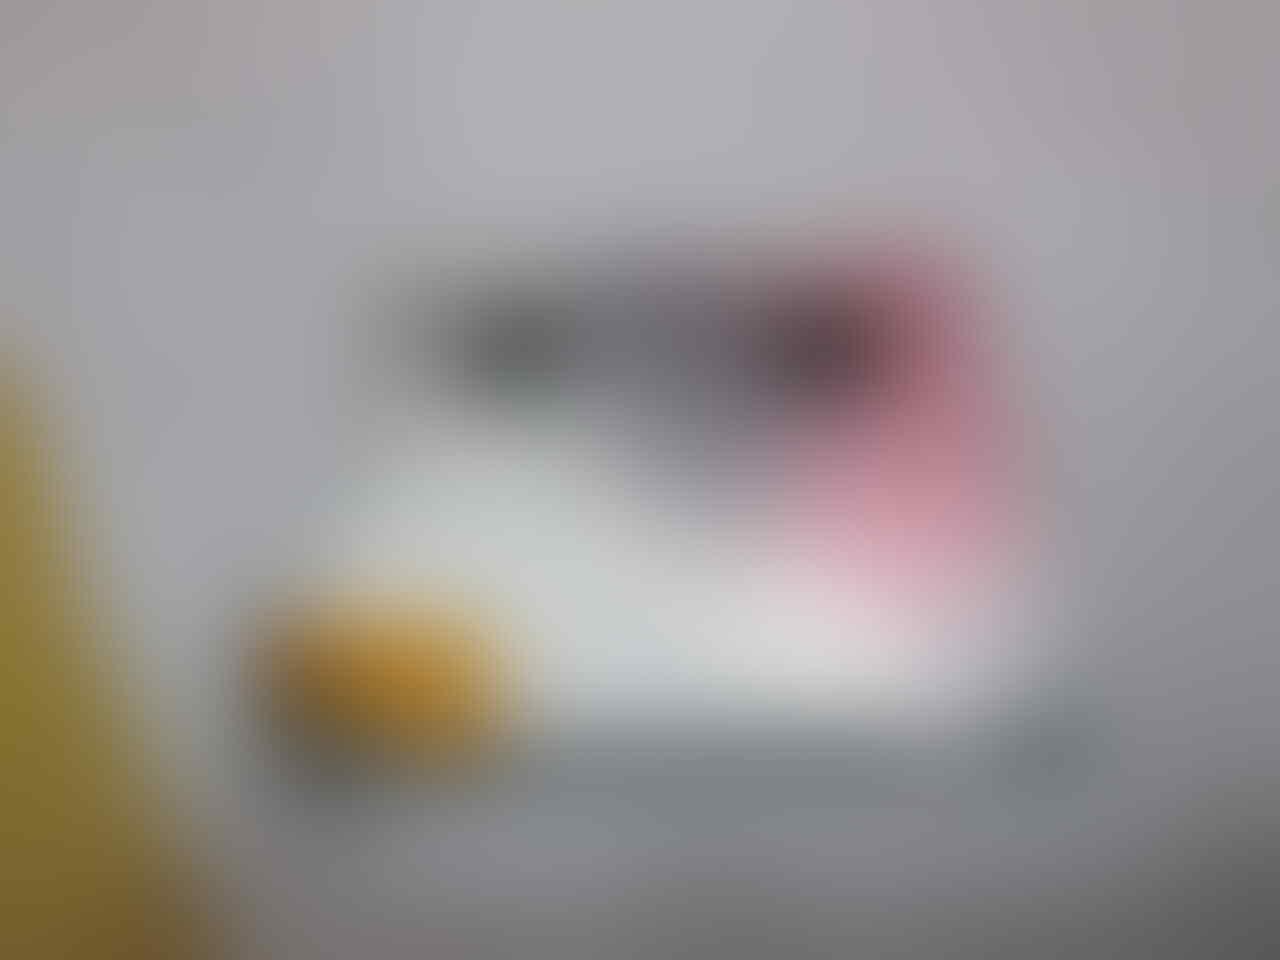 [CARI] LCD ORI Blackberry 9700/ONYX 1 BLACK SERI 002/111 (Ori RIM/ Cabutan)